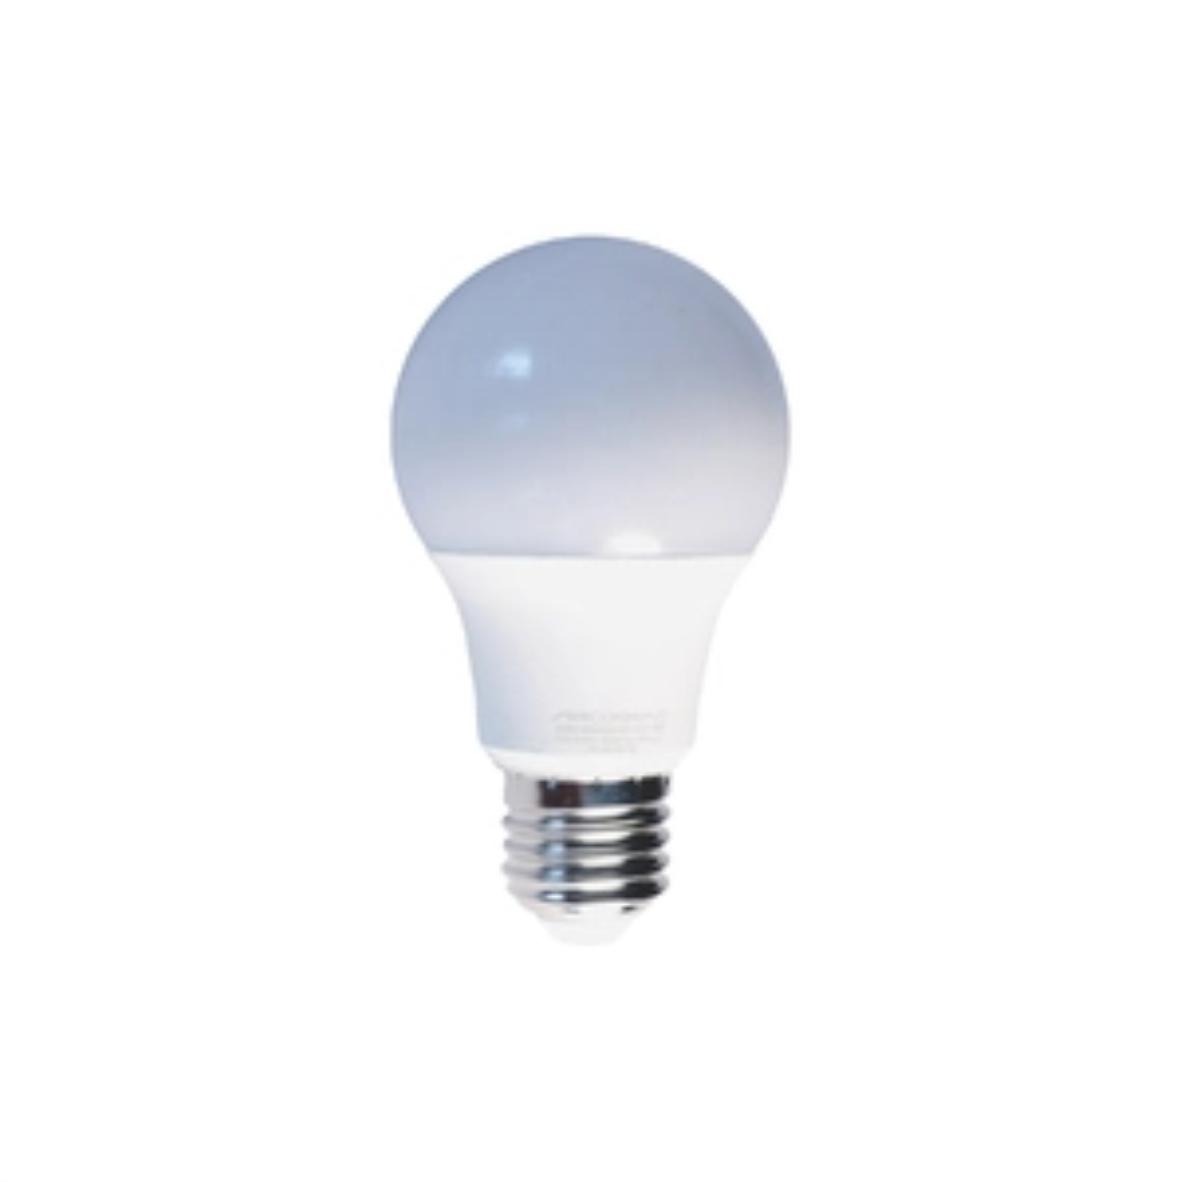 LAMPADA LED L0RENLED 6W